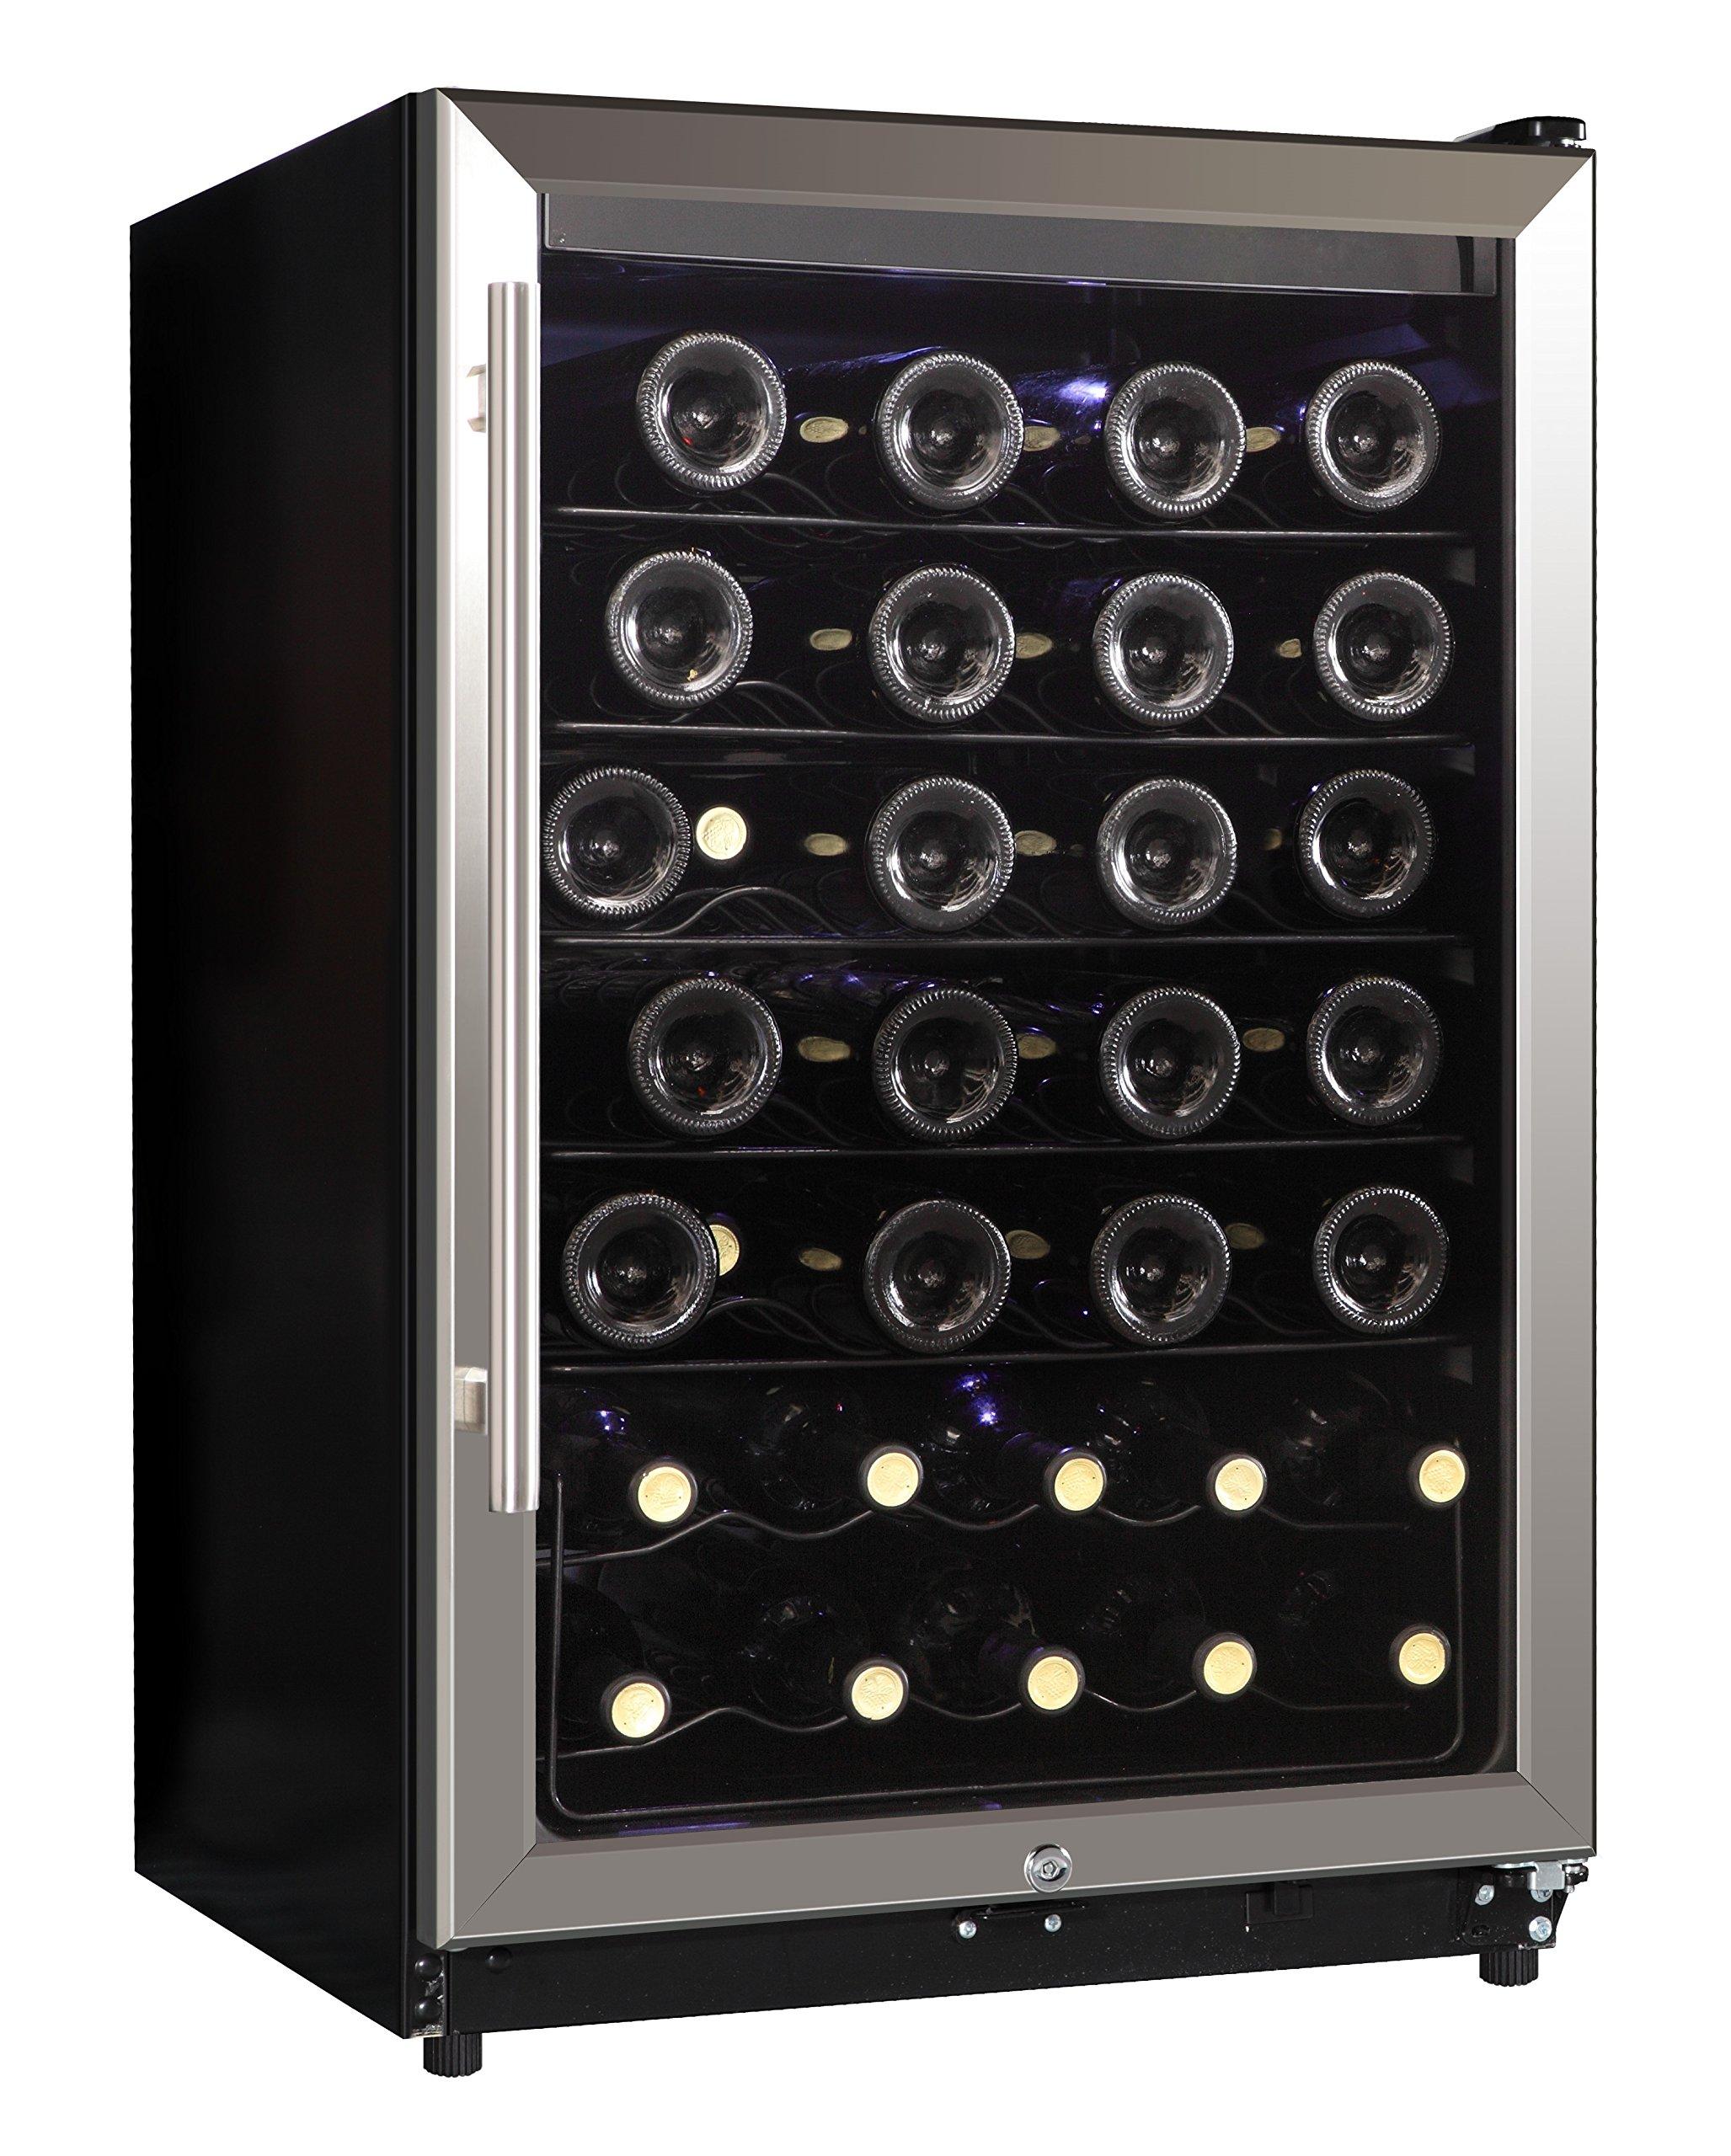 Midea WHS-169WES1 45-Bottle Free Standing Wine Cooler,  Metal Shelves, Black with Stainless Steel Door